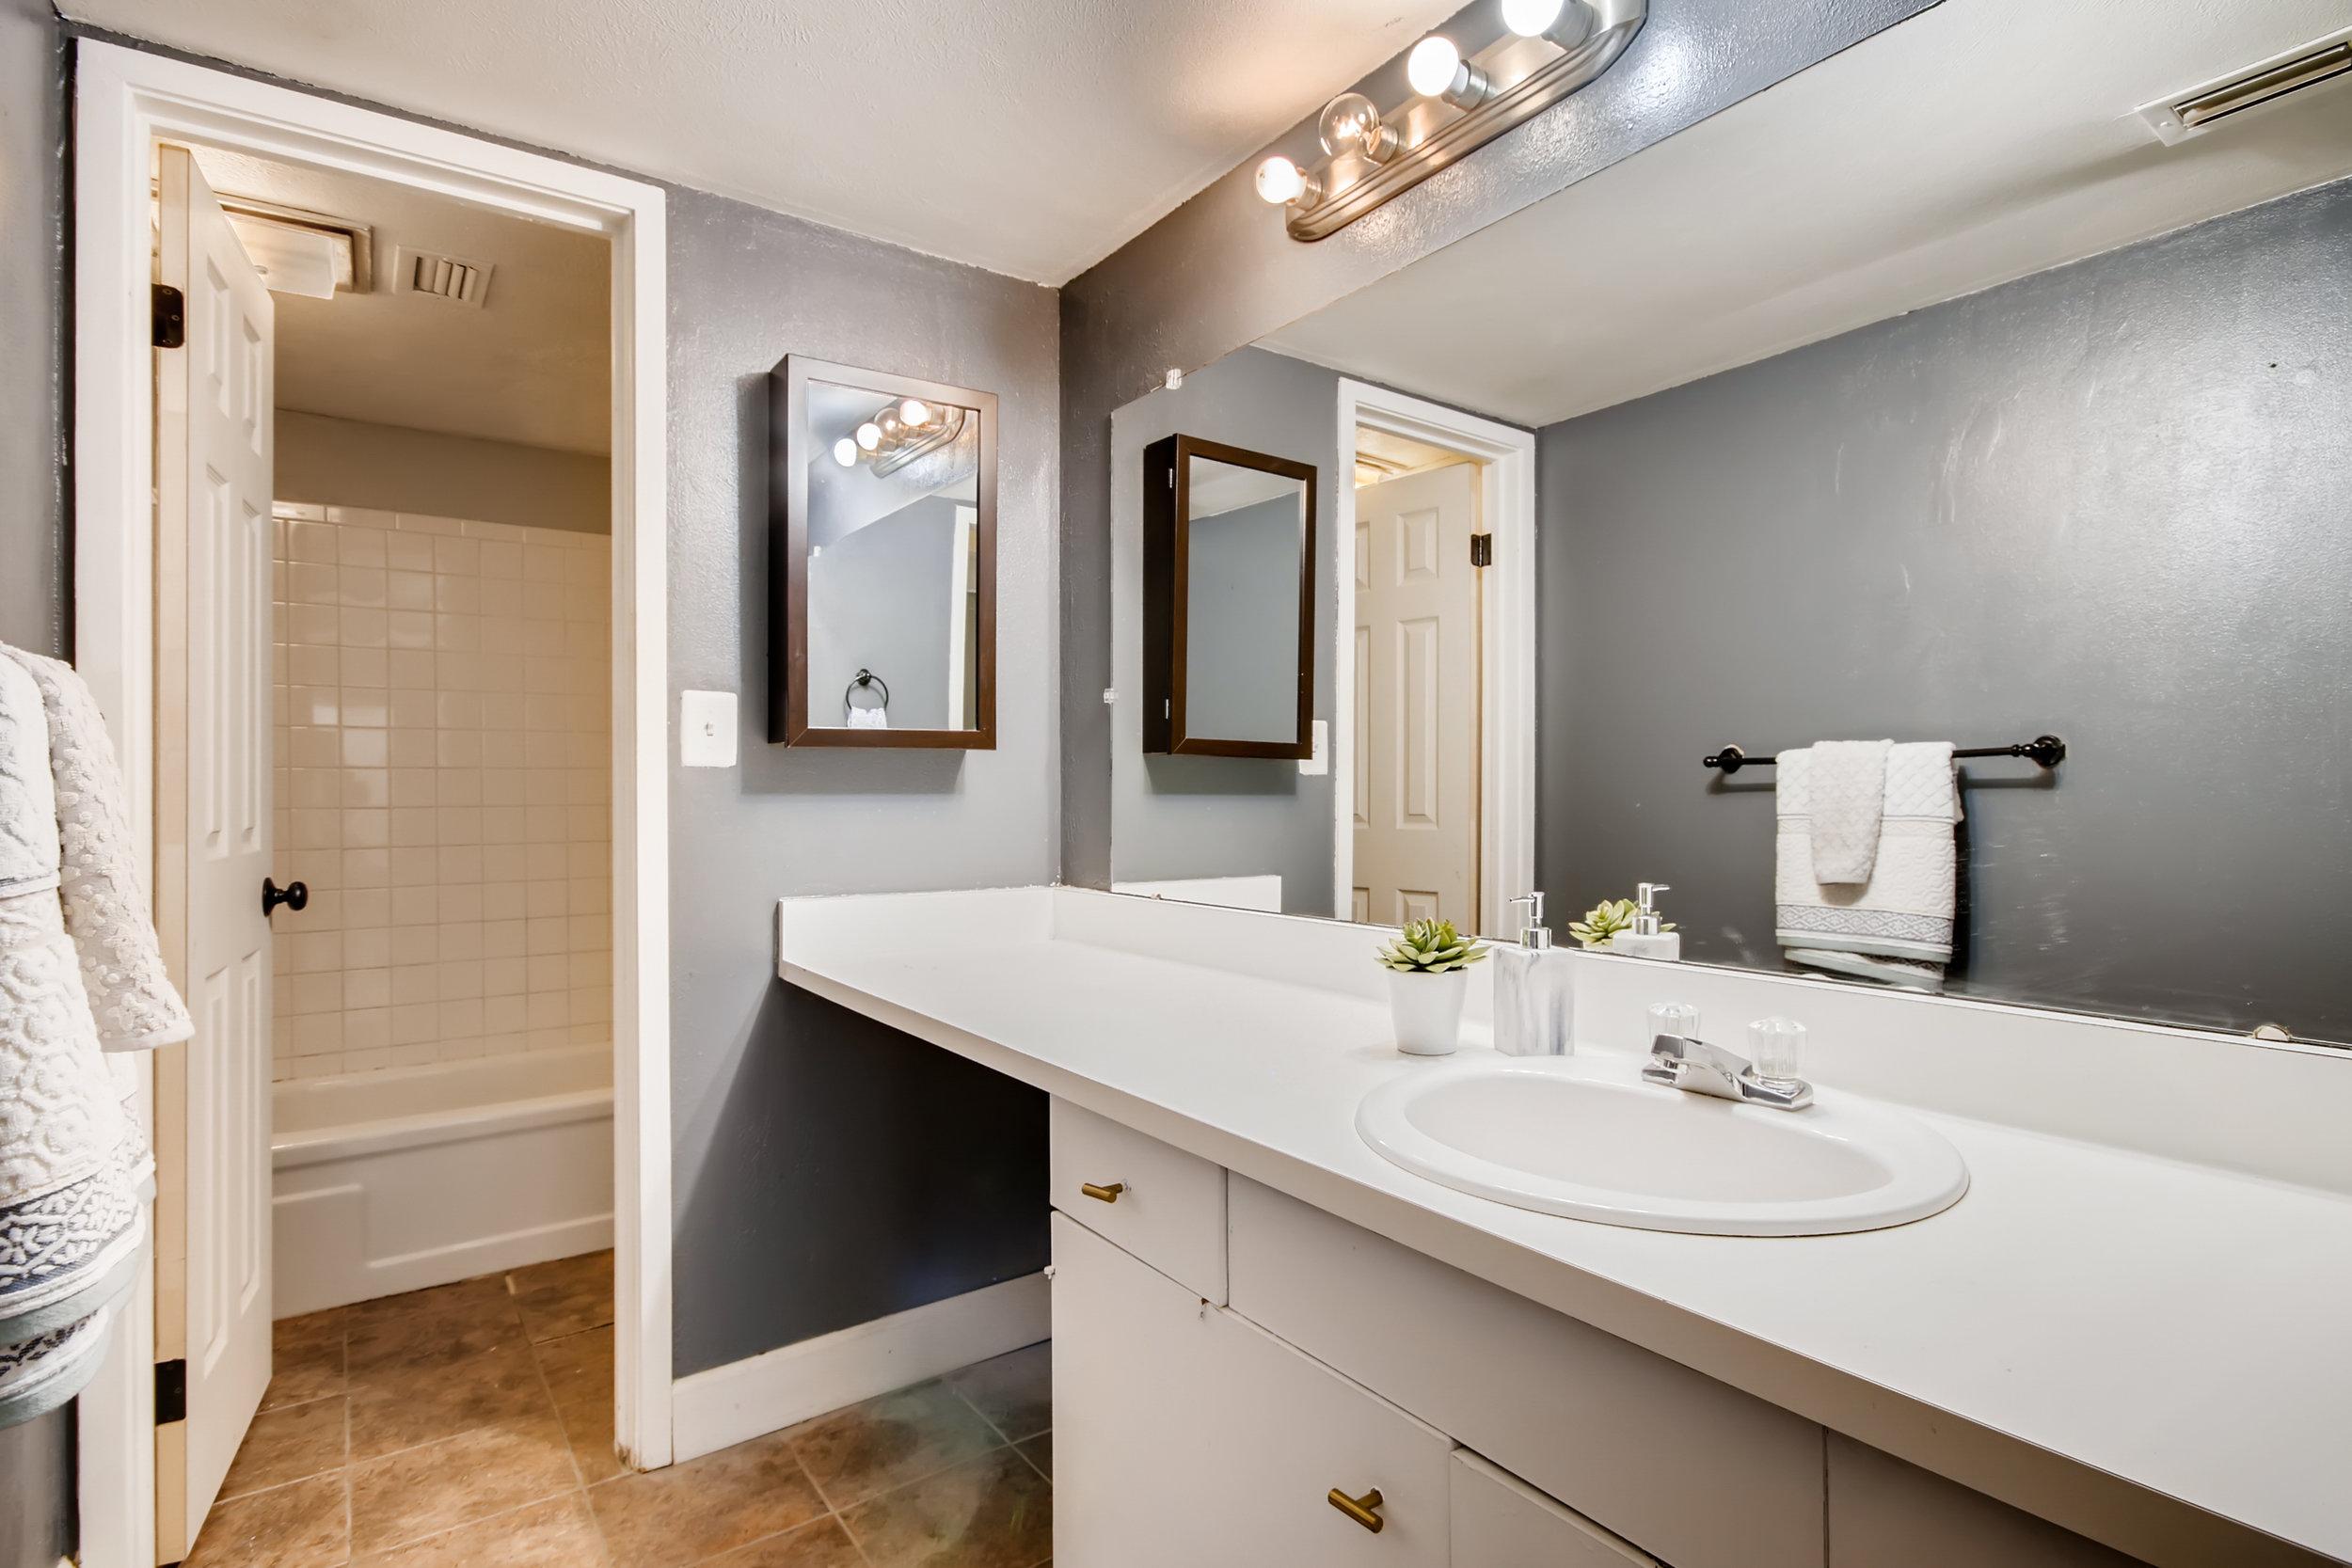 9700 E Illif Ave E48 Denver CO-print-019-021-Master Bathroom-3600x2400-300dpi.jpg